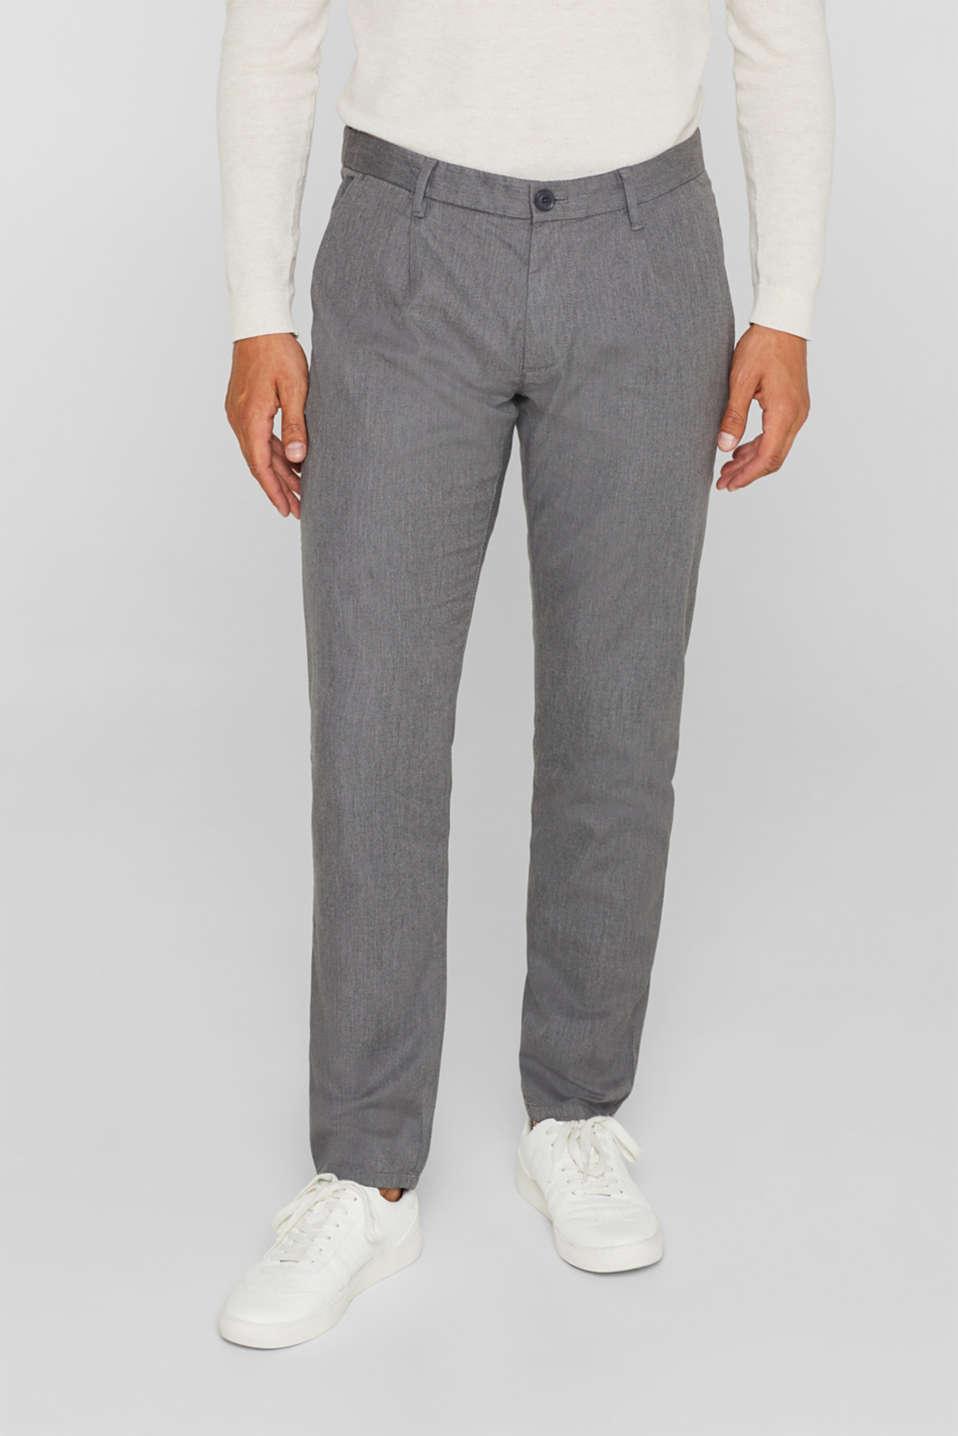 Stretch cotton chinos